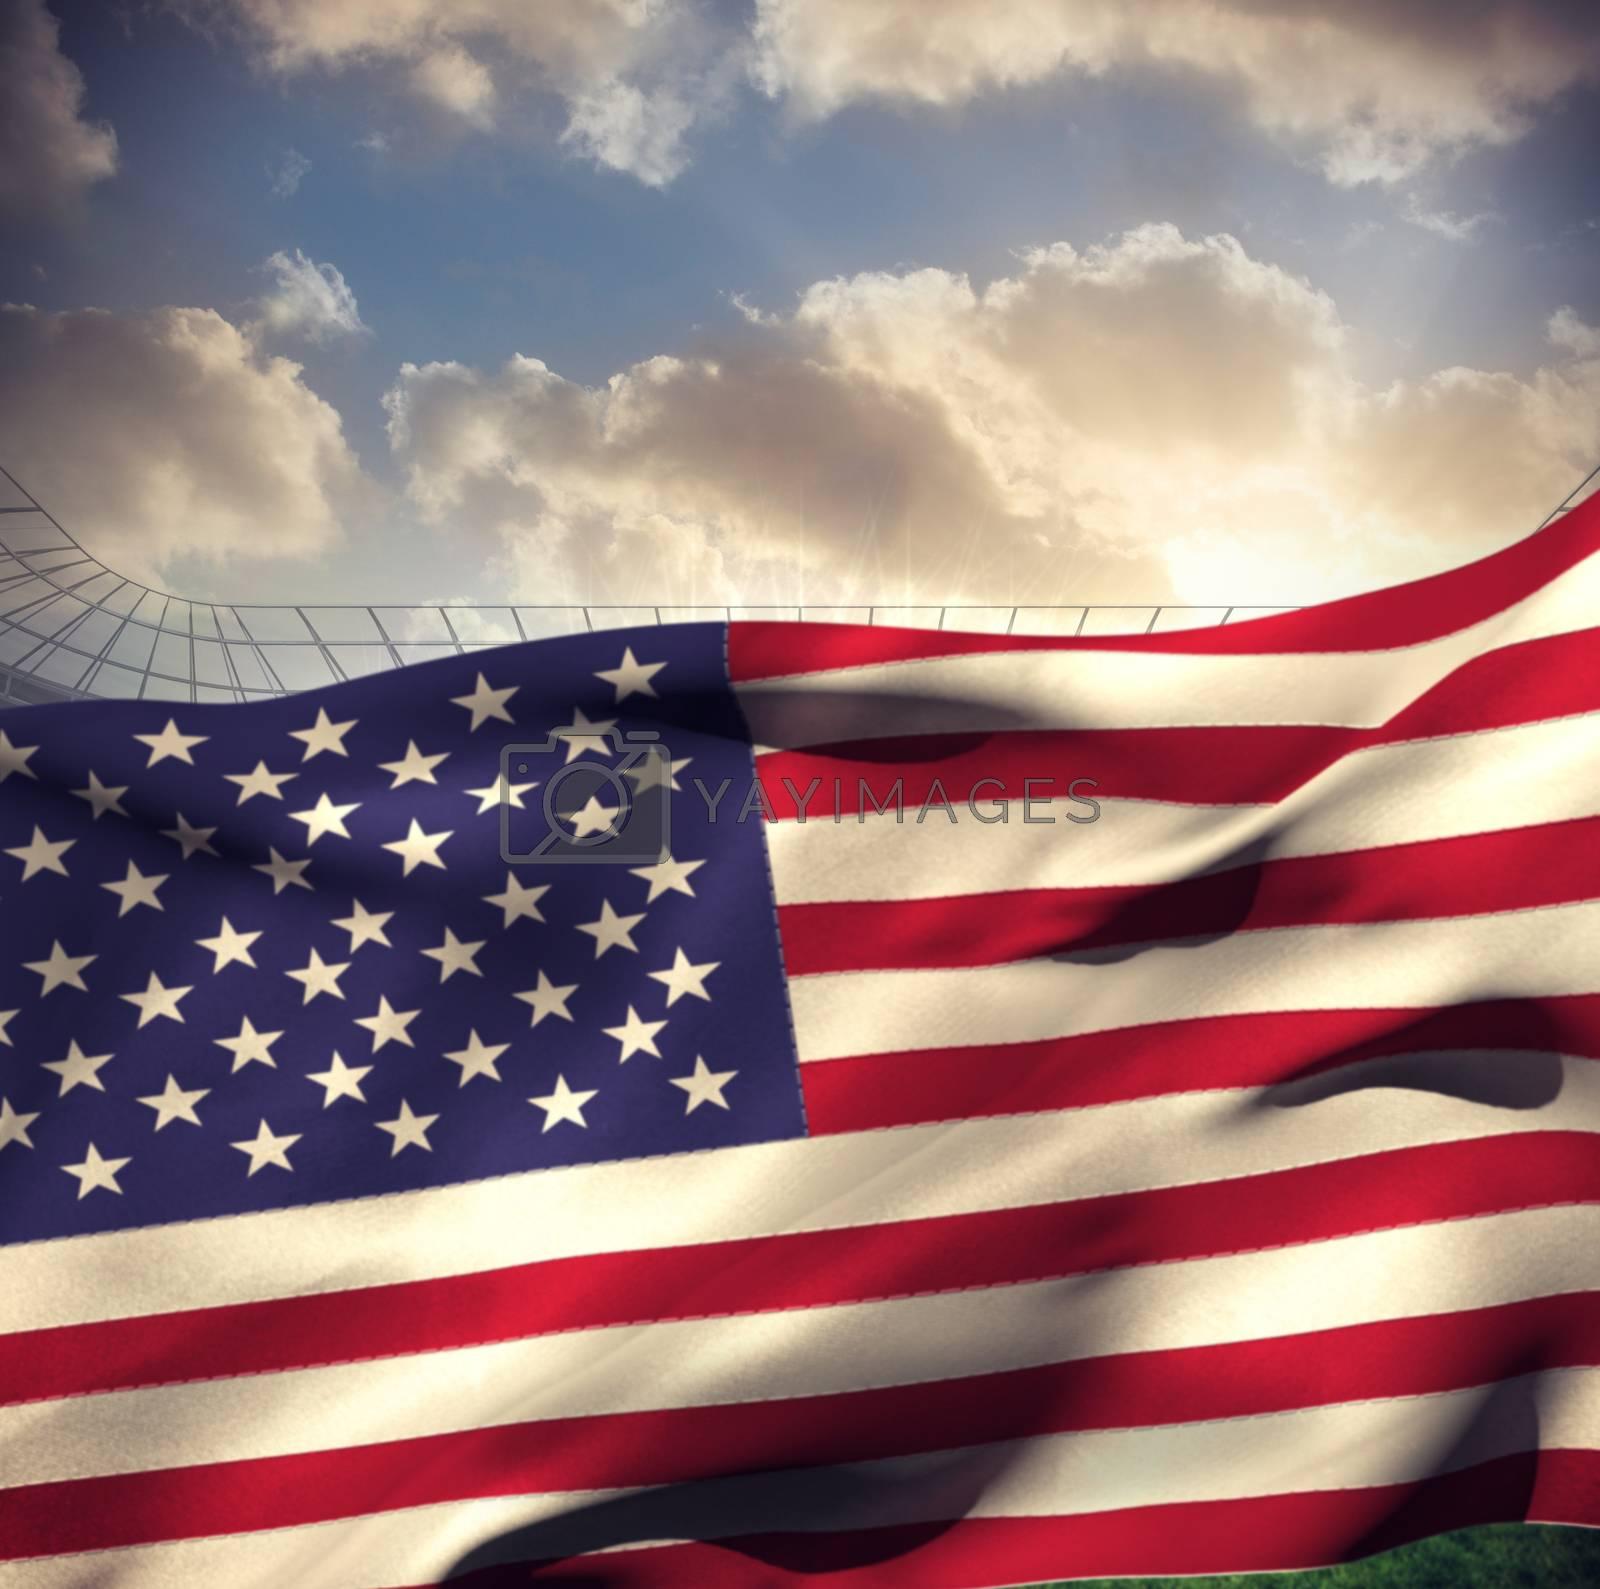 Waving American flag against large football stadium under cloudy blue sky